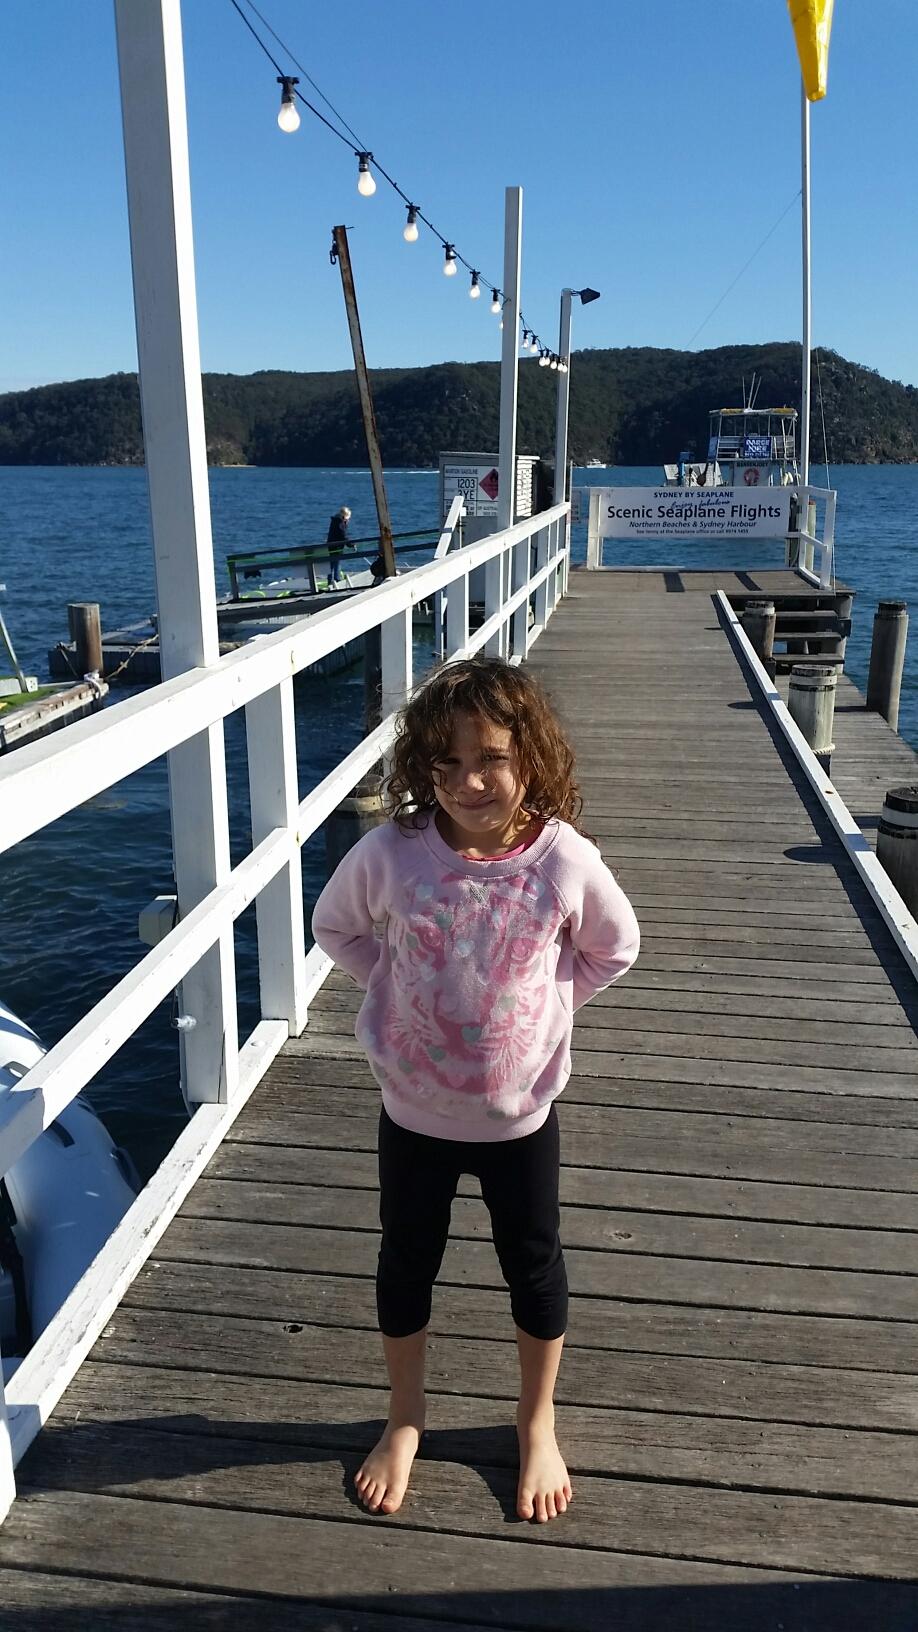 Palm Beach, Sydney, NSW, Australia - The Wiringi's Family Blog